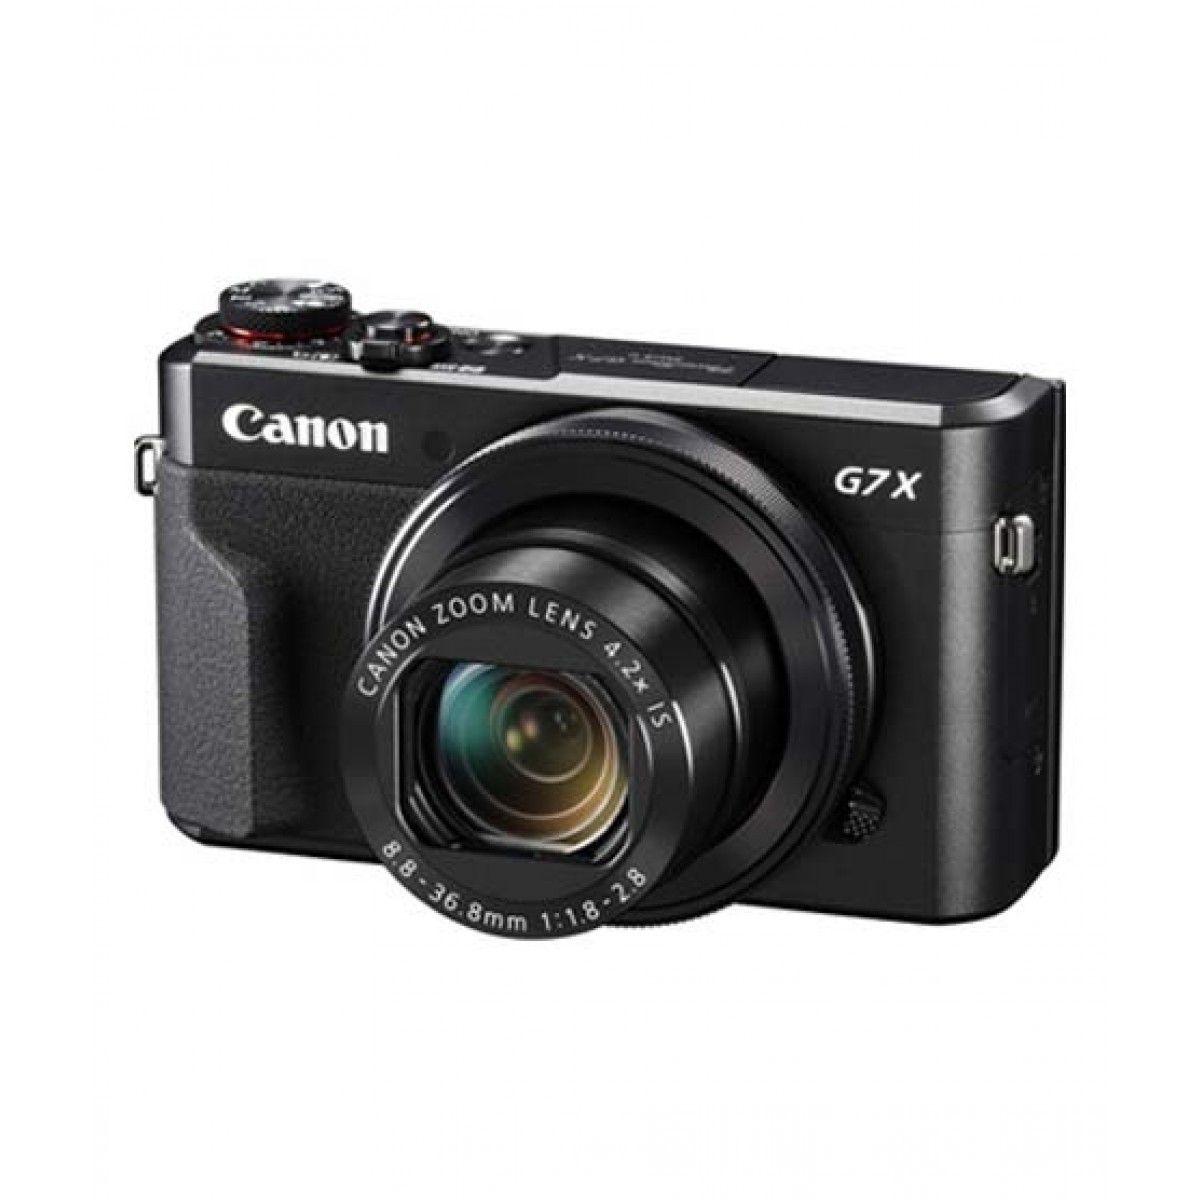 Canon PowerShot G7 X Mark II Digital Camera Black